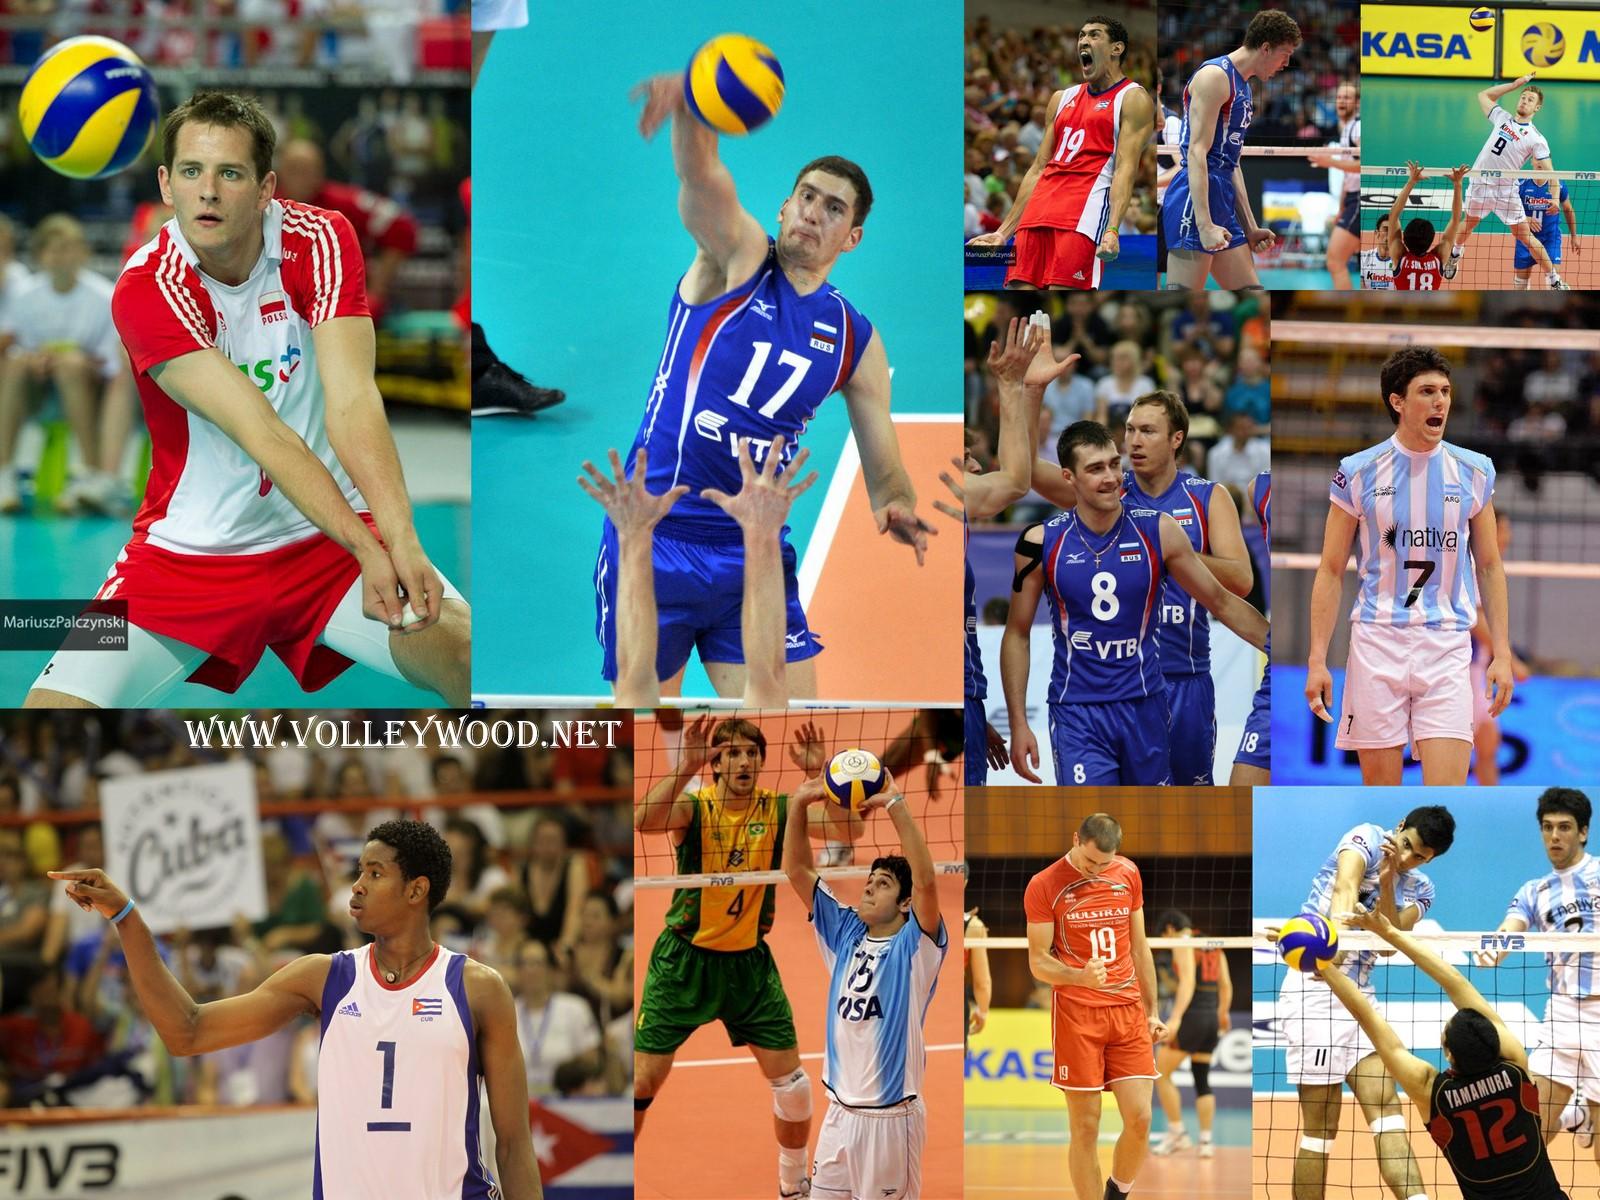 2011 world league best players